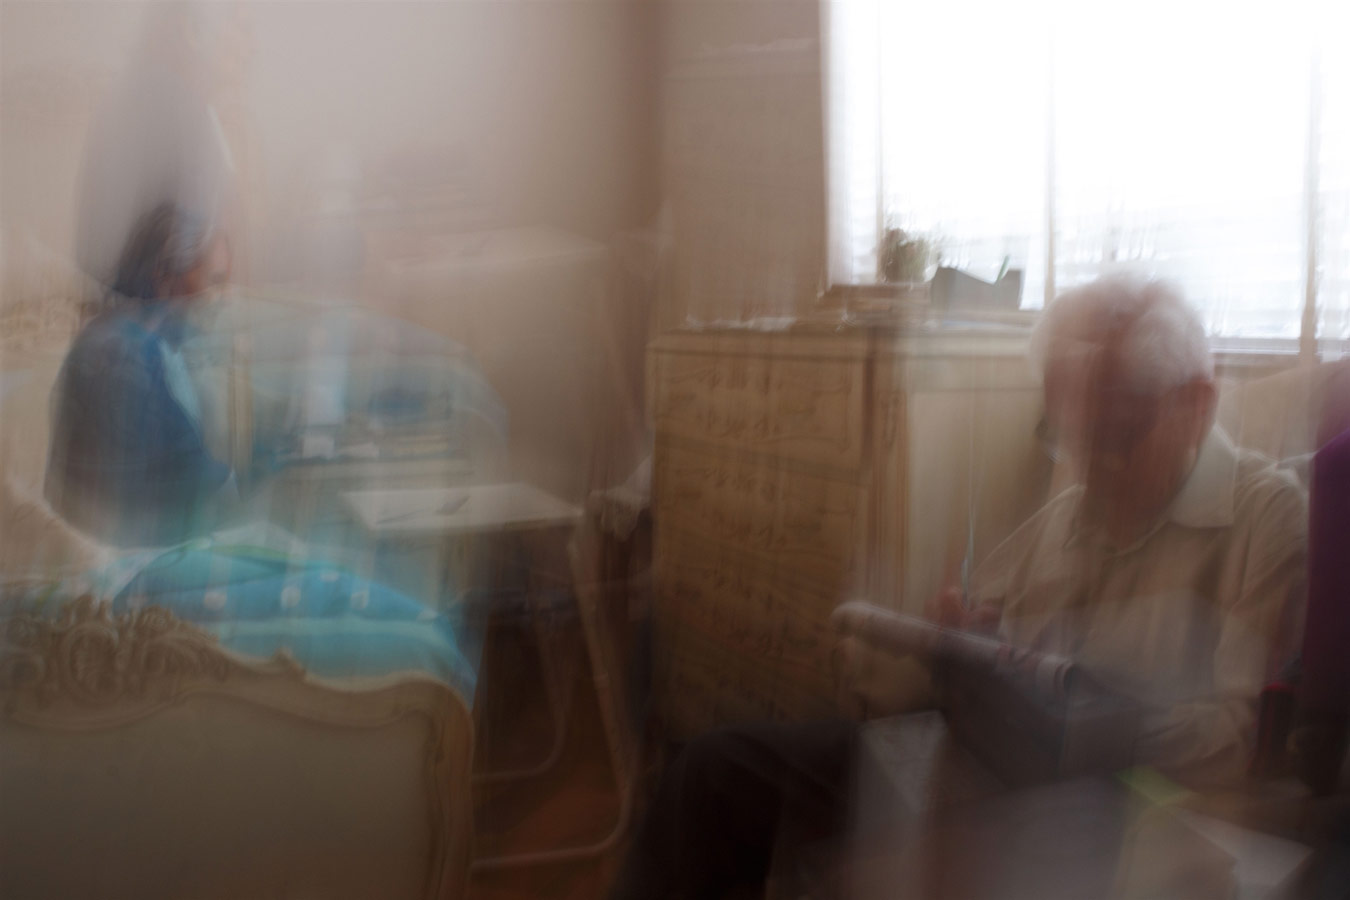 © María Alejandra Olórtegui, Abuelos, Photography 24 x 14, The Chelsea International Photography Competition